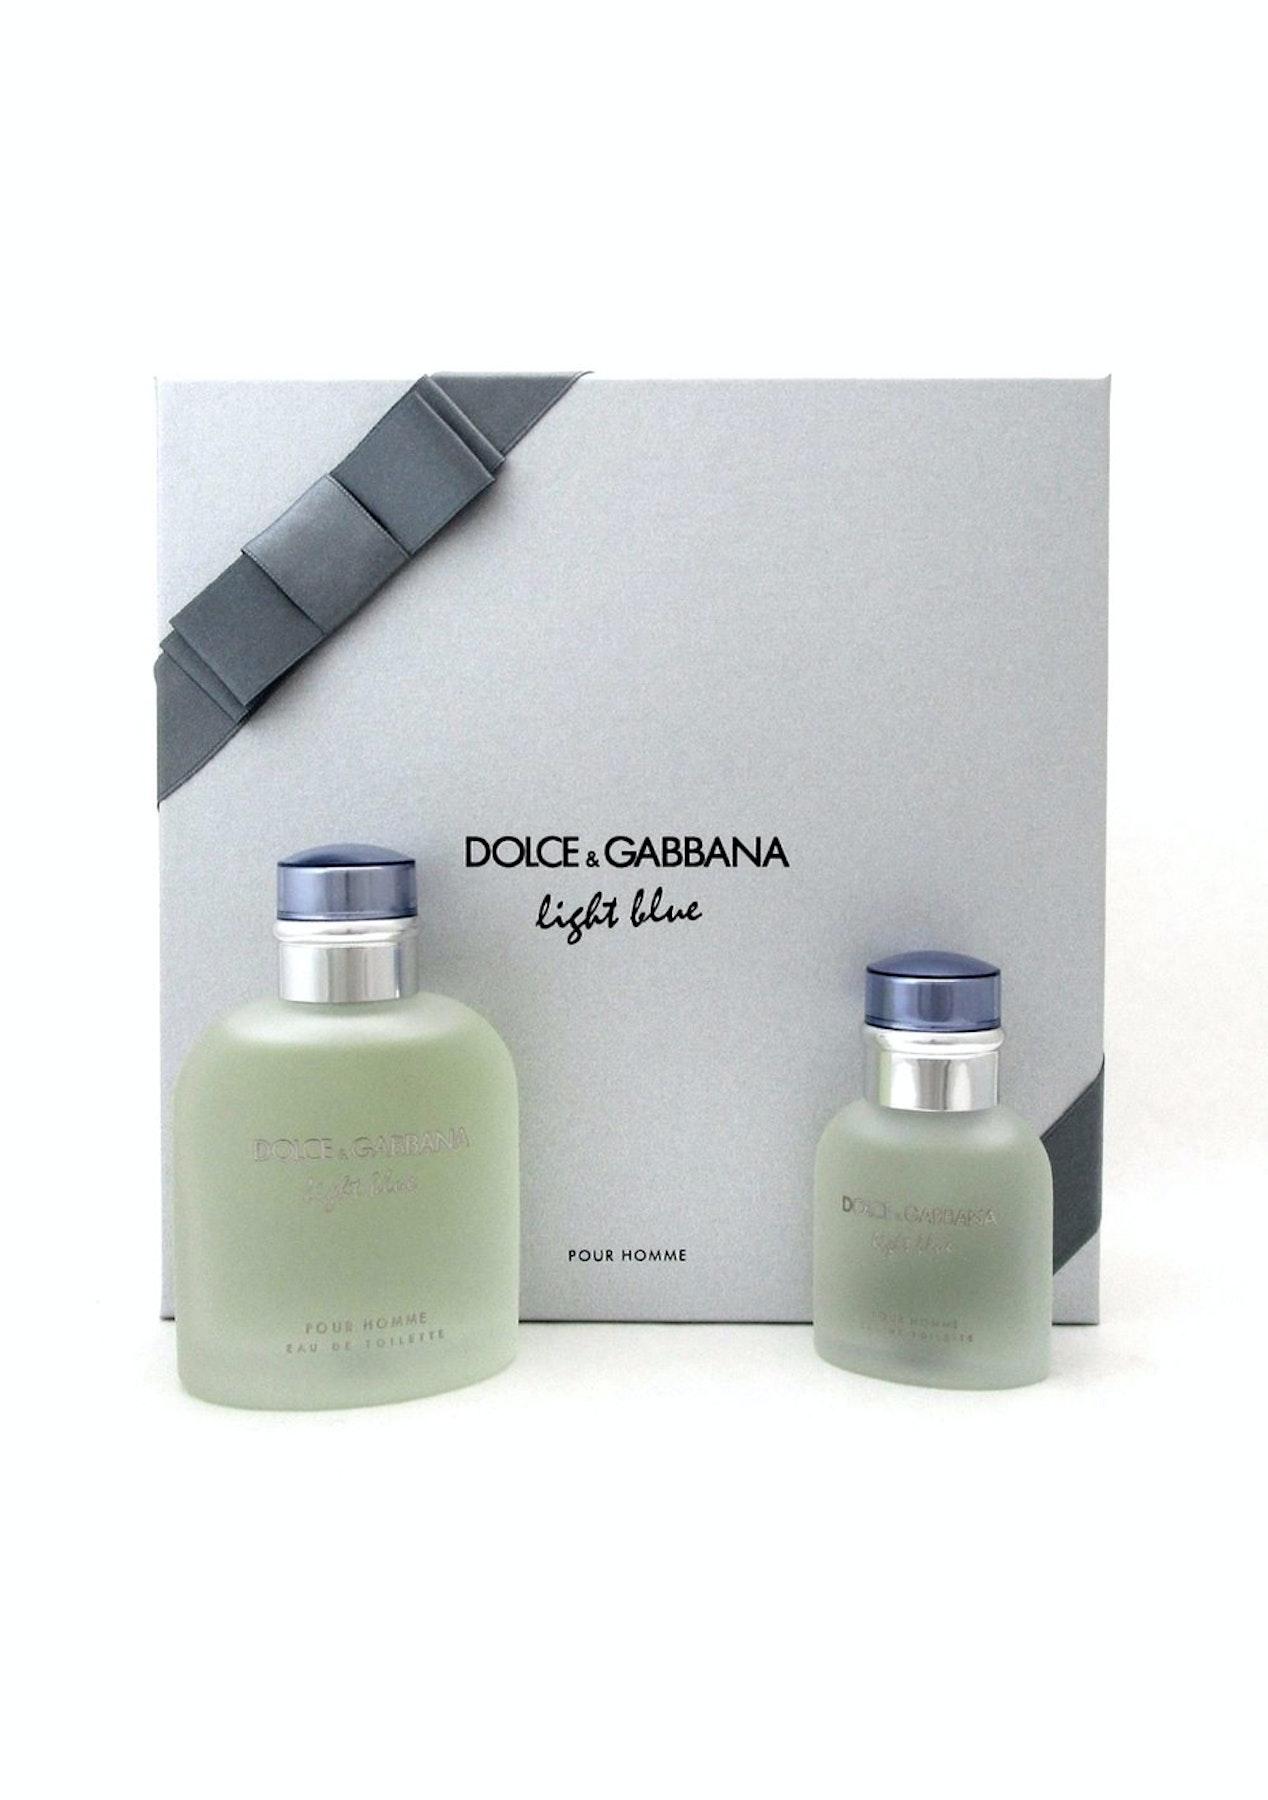 bf8a8ec5b68c2 Dolce   Gabbana Light Blue Pour Homme 2 Piece Set - Gifts for Him - Onceit